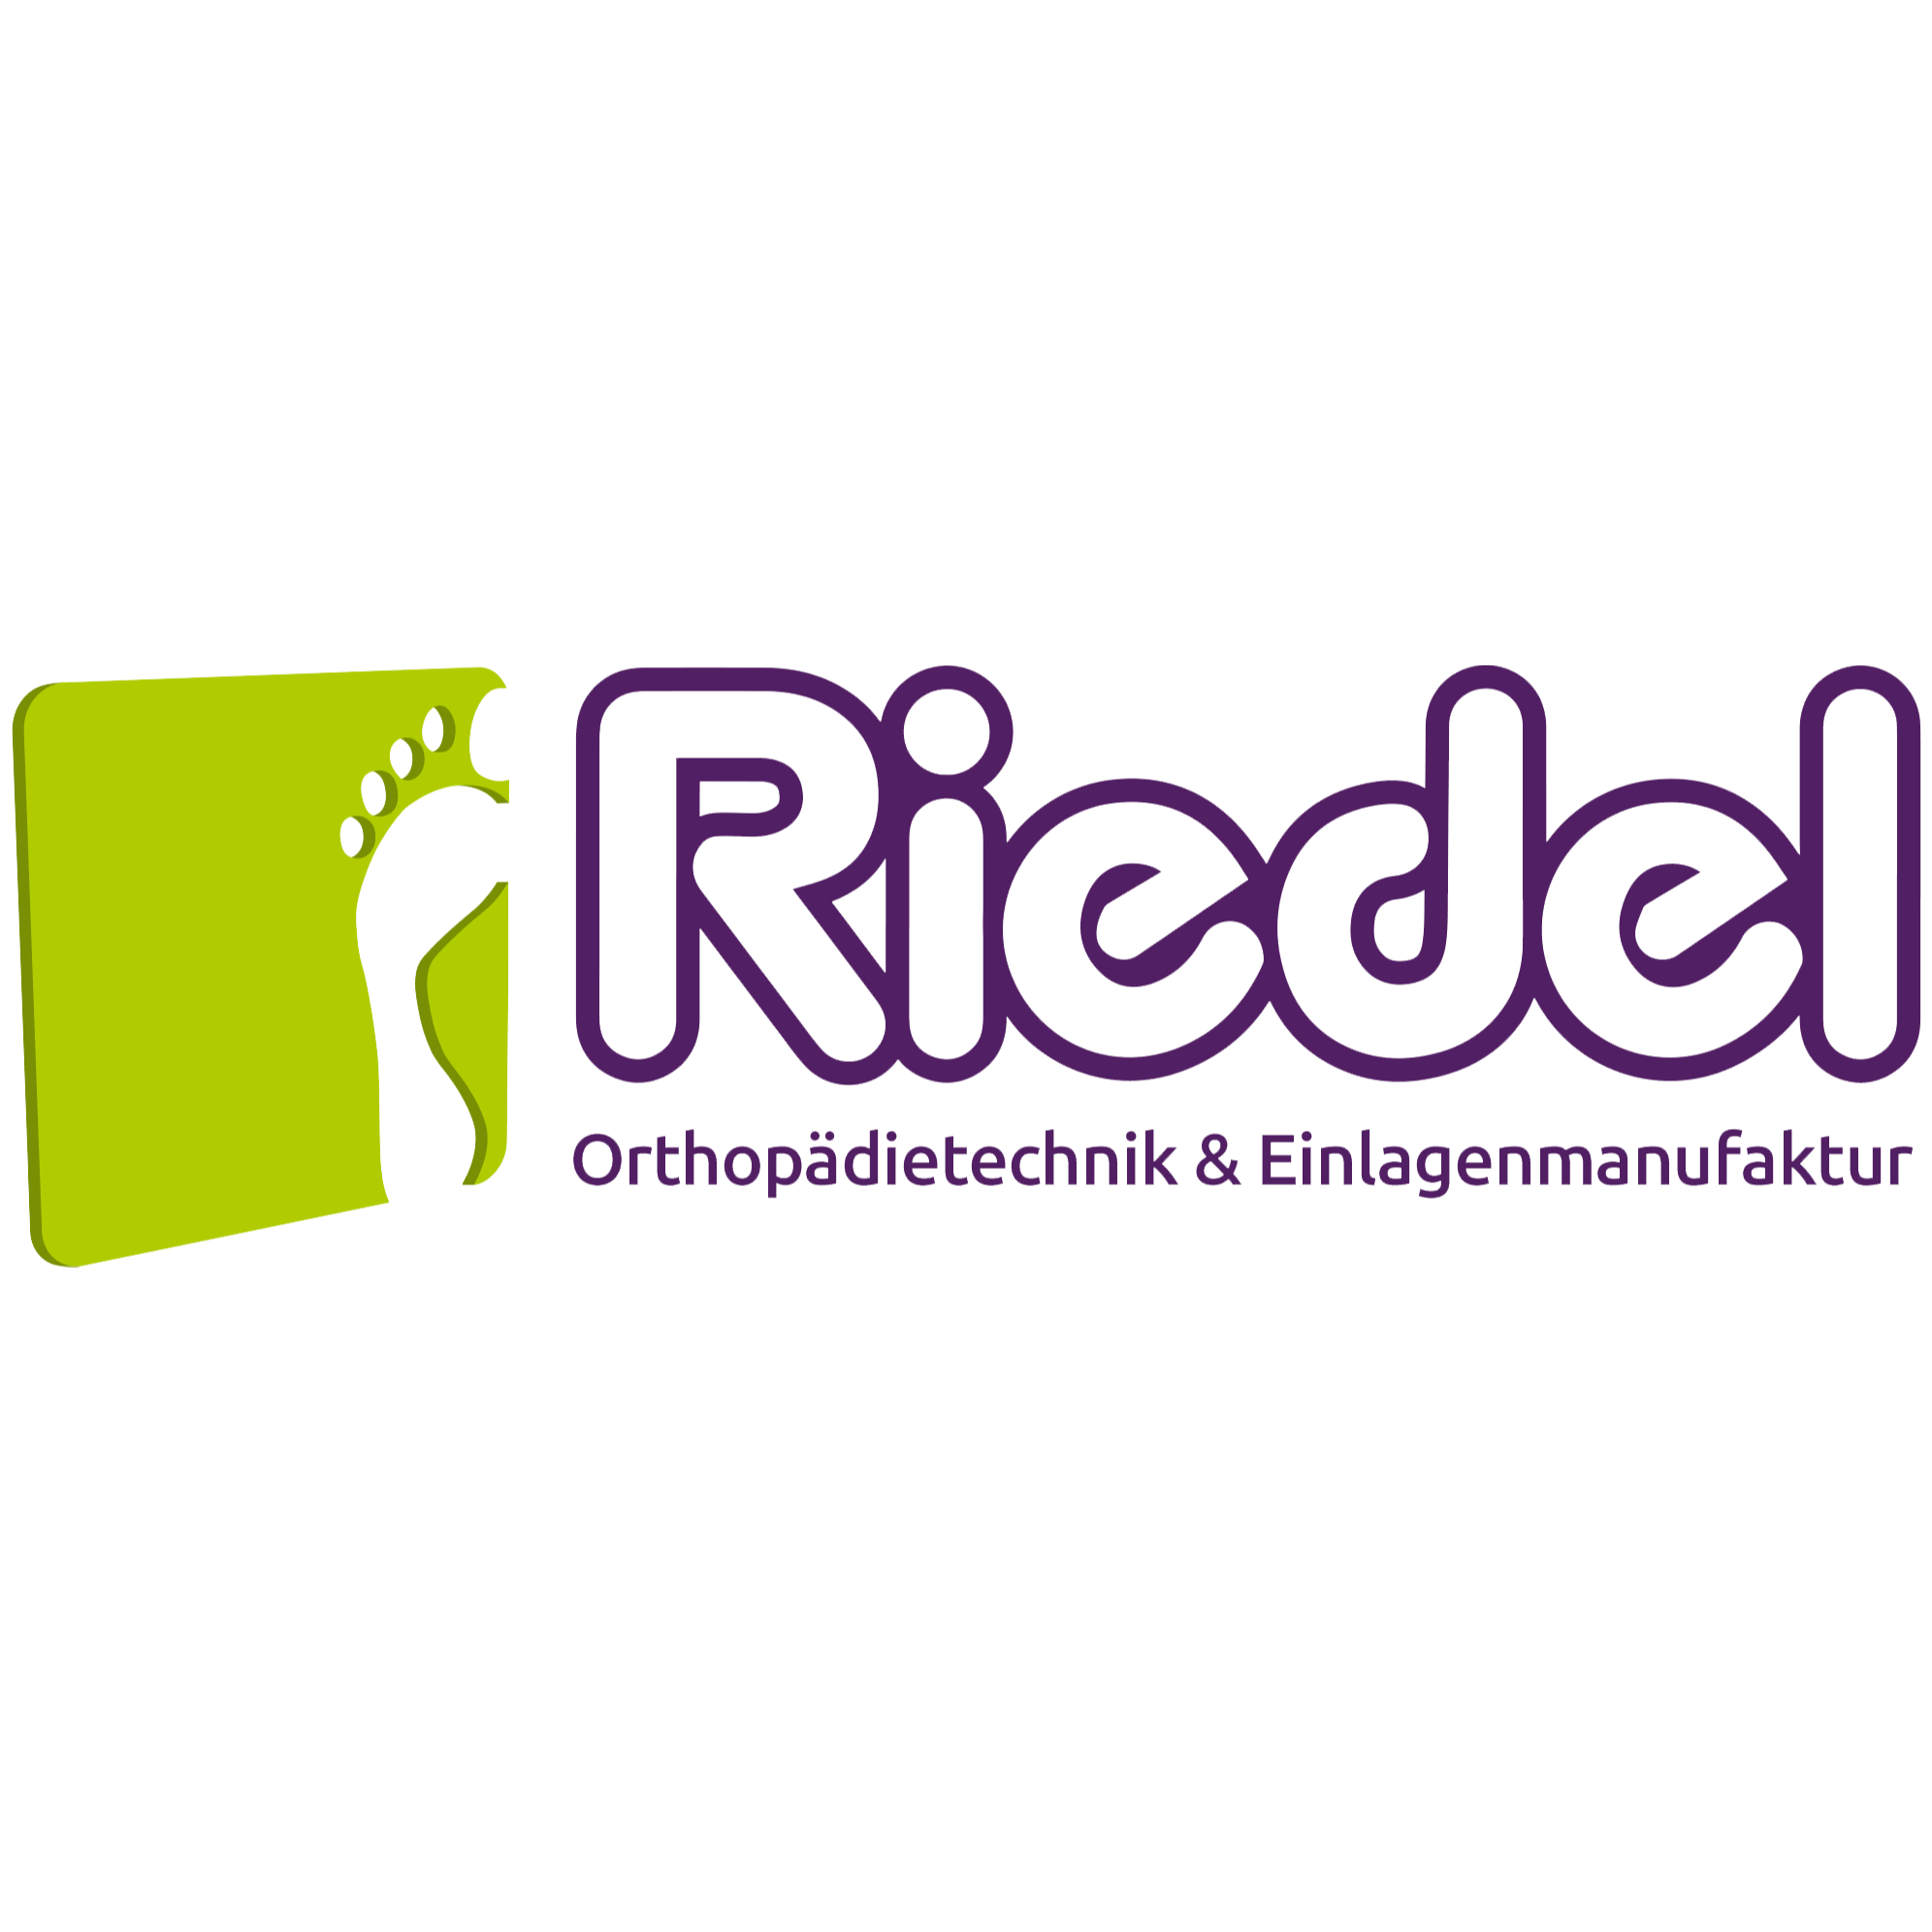 Bild zu Riedel Orthopädie in Nürnberg